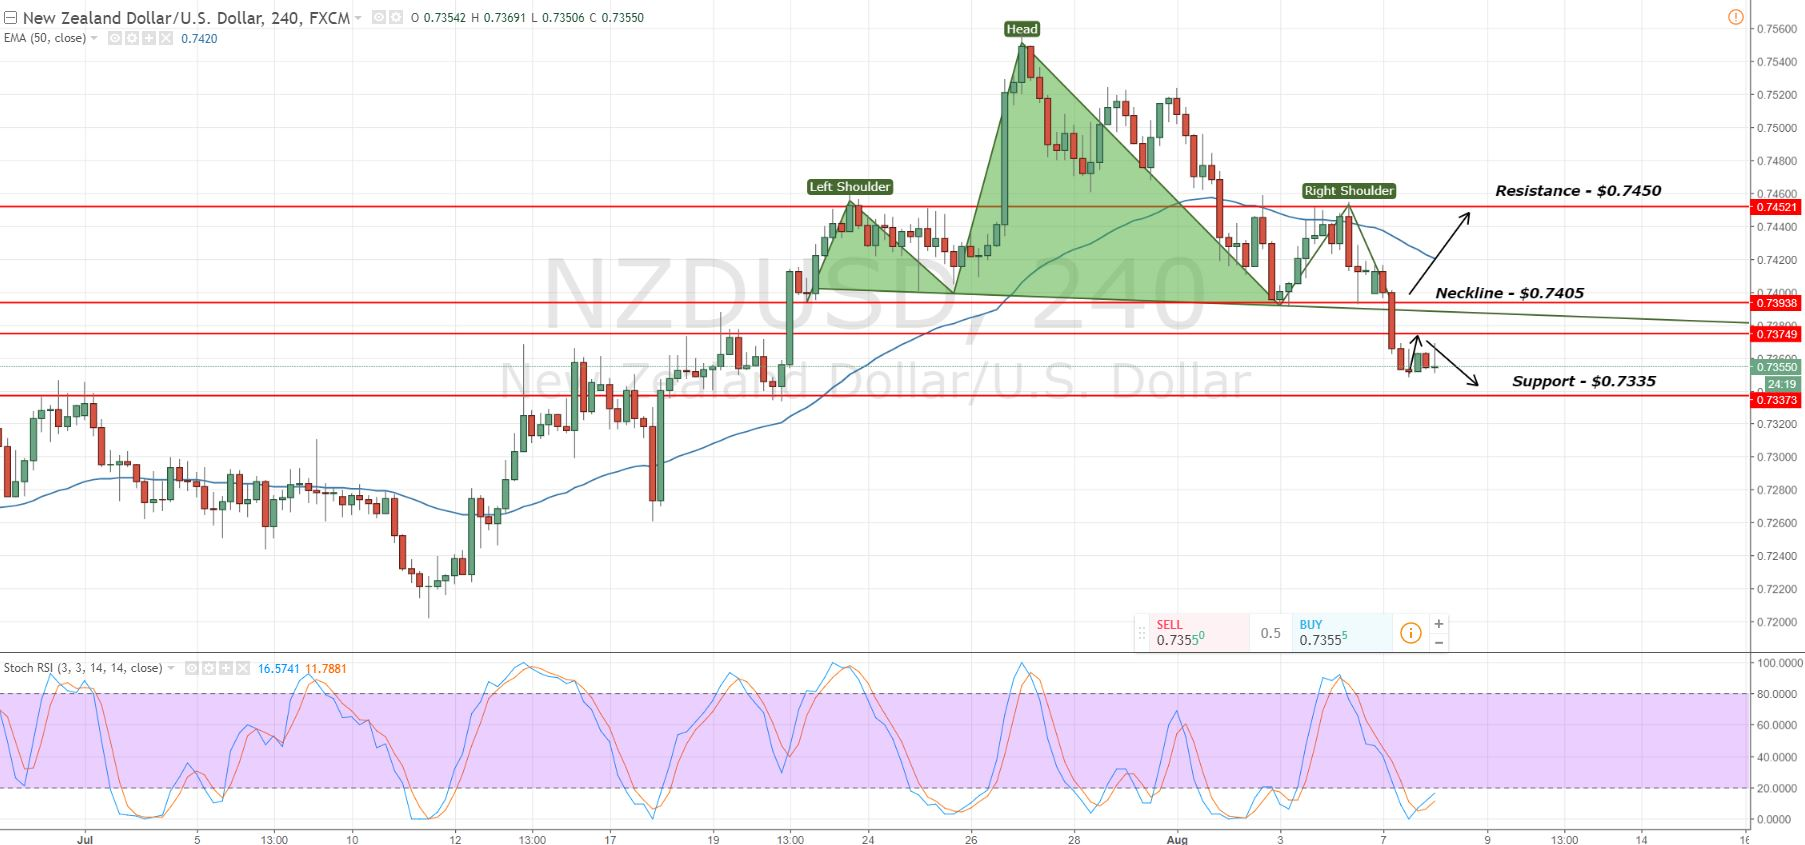 NZDUSD - 2 Hours Chart - Heading Towards Target